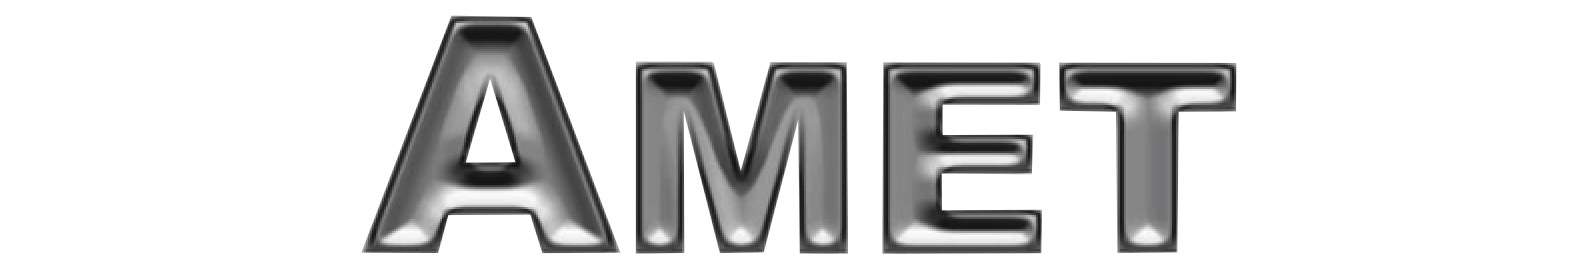 logo_process_1.jpg